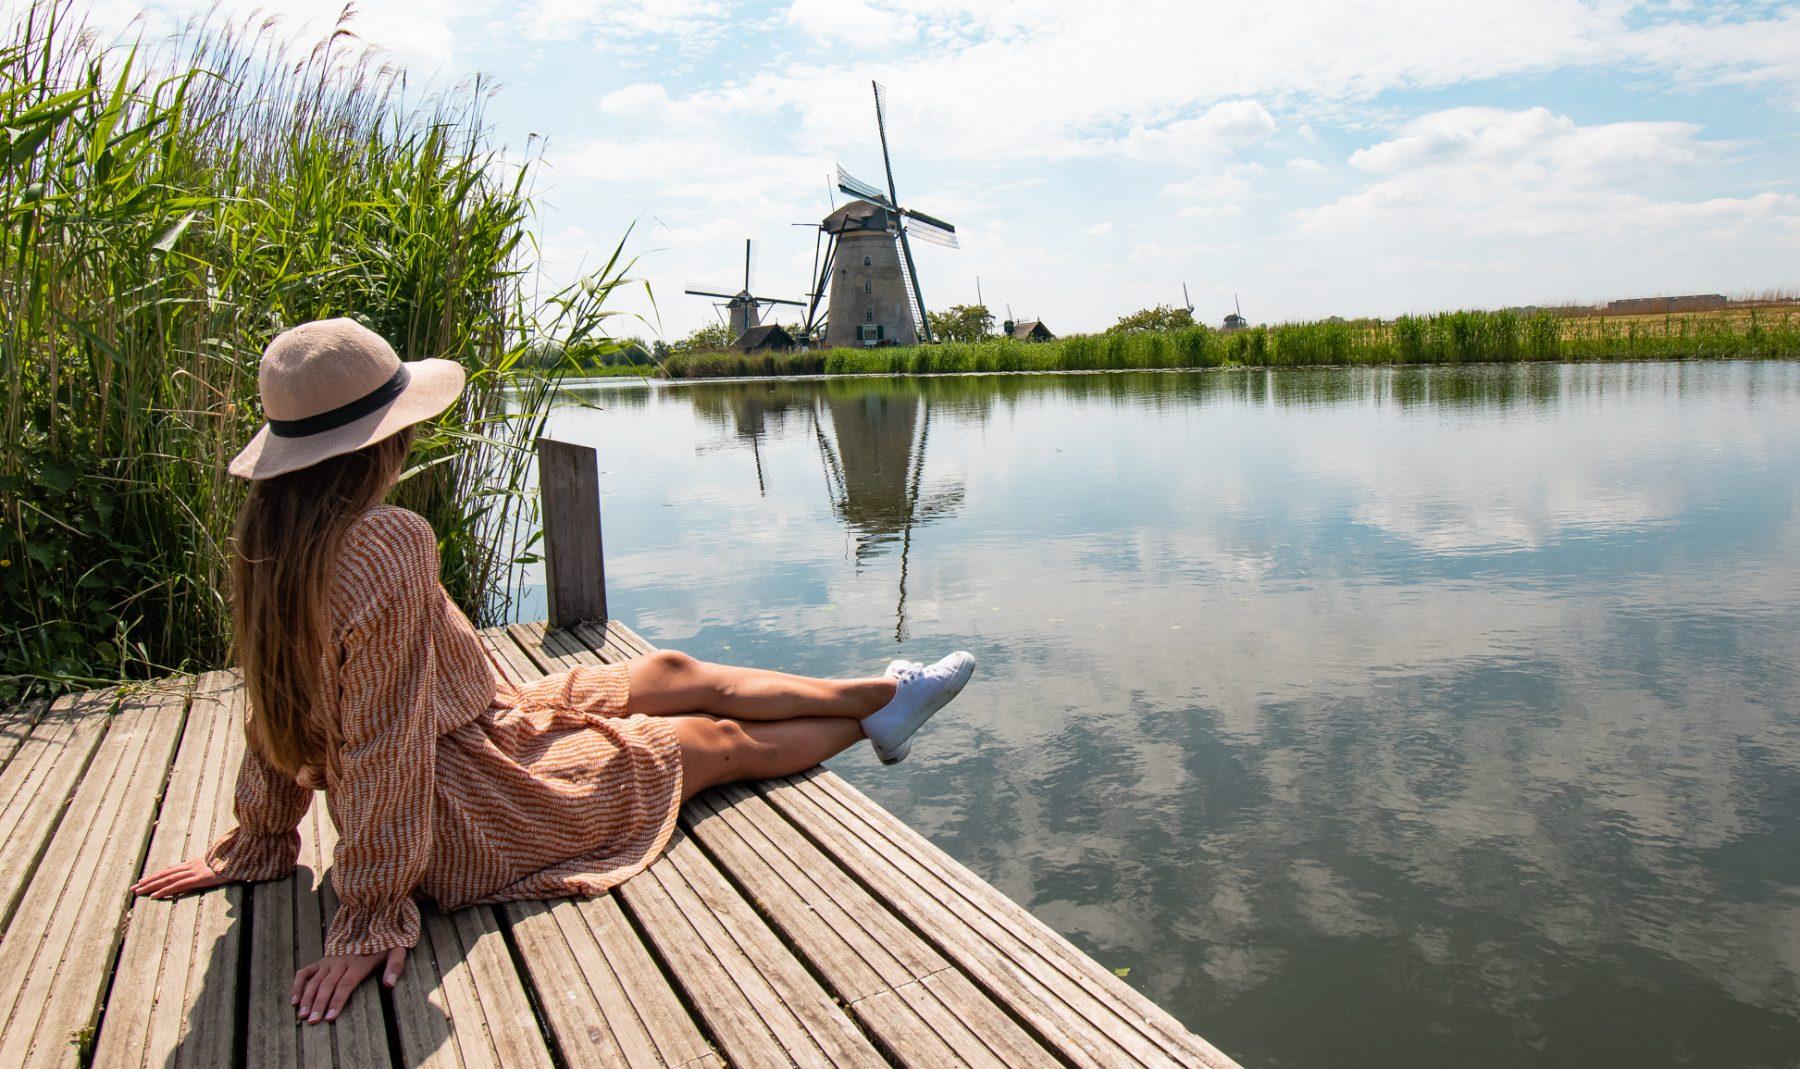 10 x de mooiste plekjes in Nederland volgens WeAreTravellers Roëll